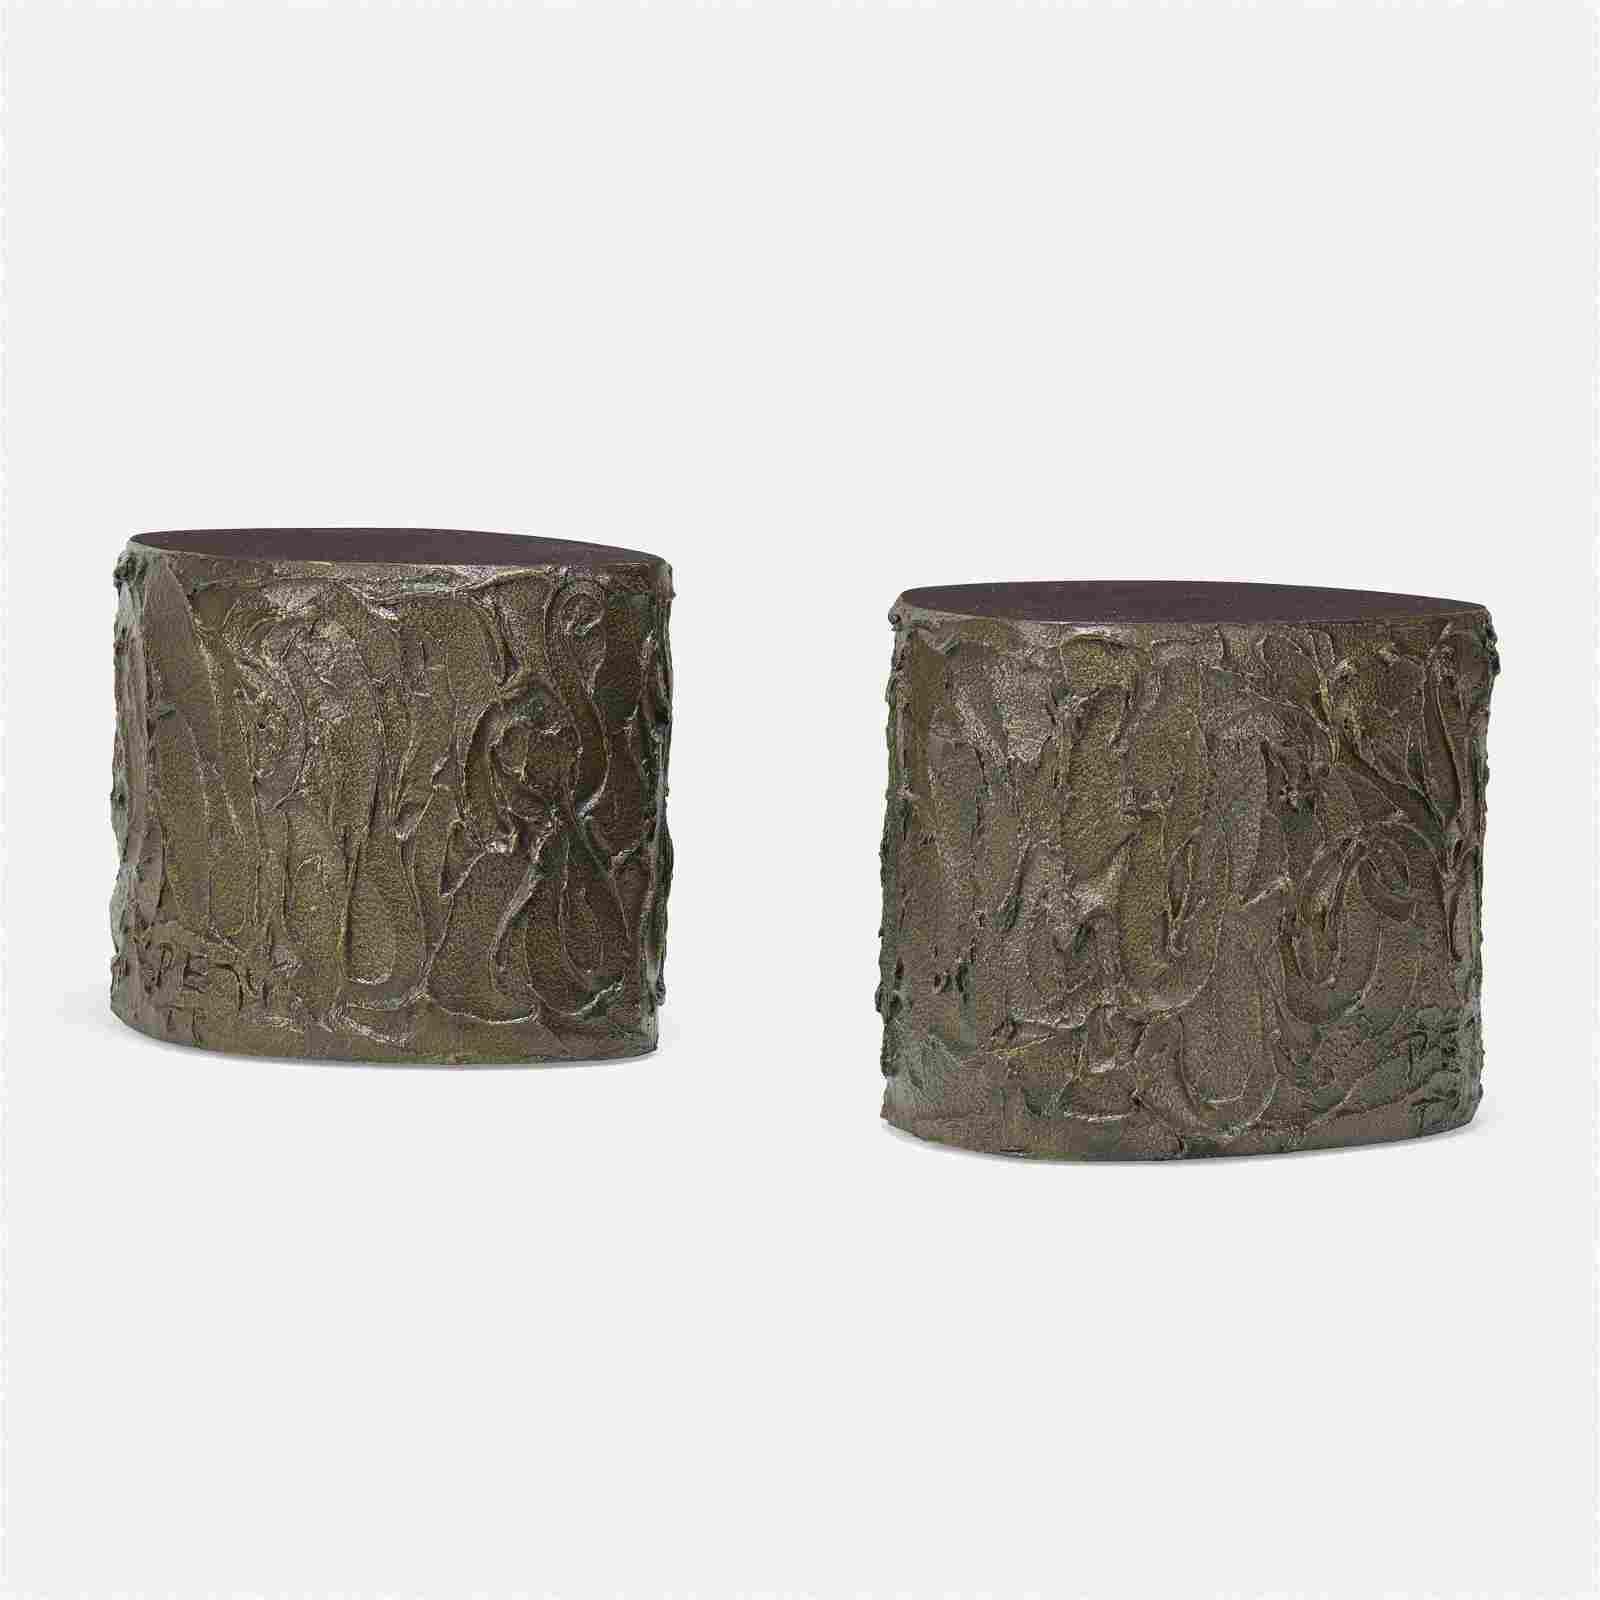 Paul Evans, Sculpted Bronze occasional tables, pair